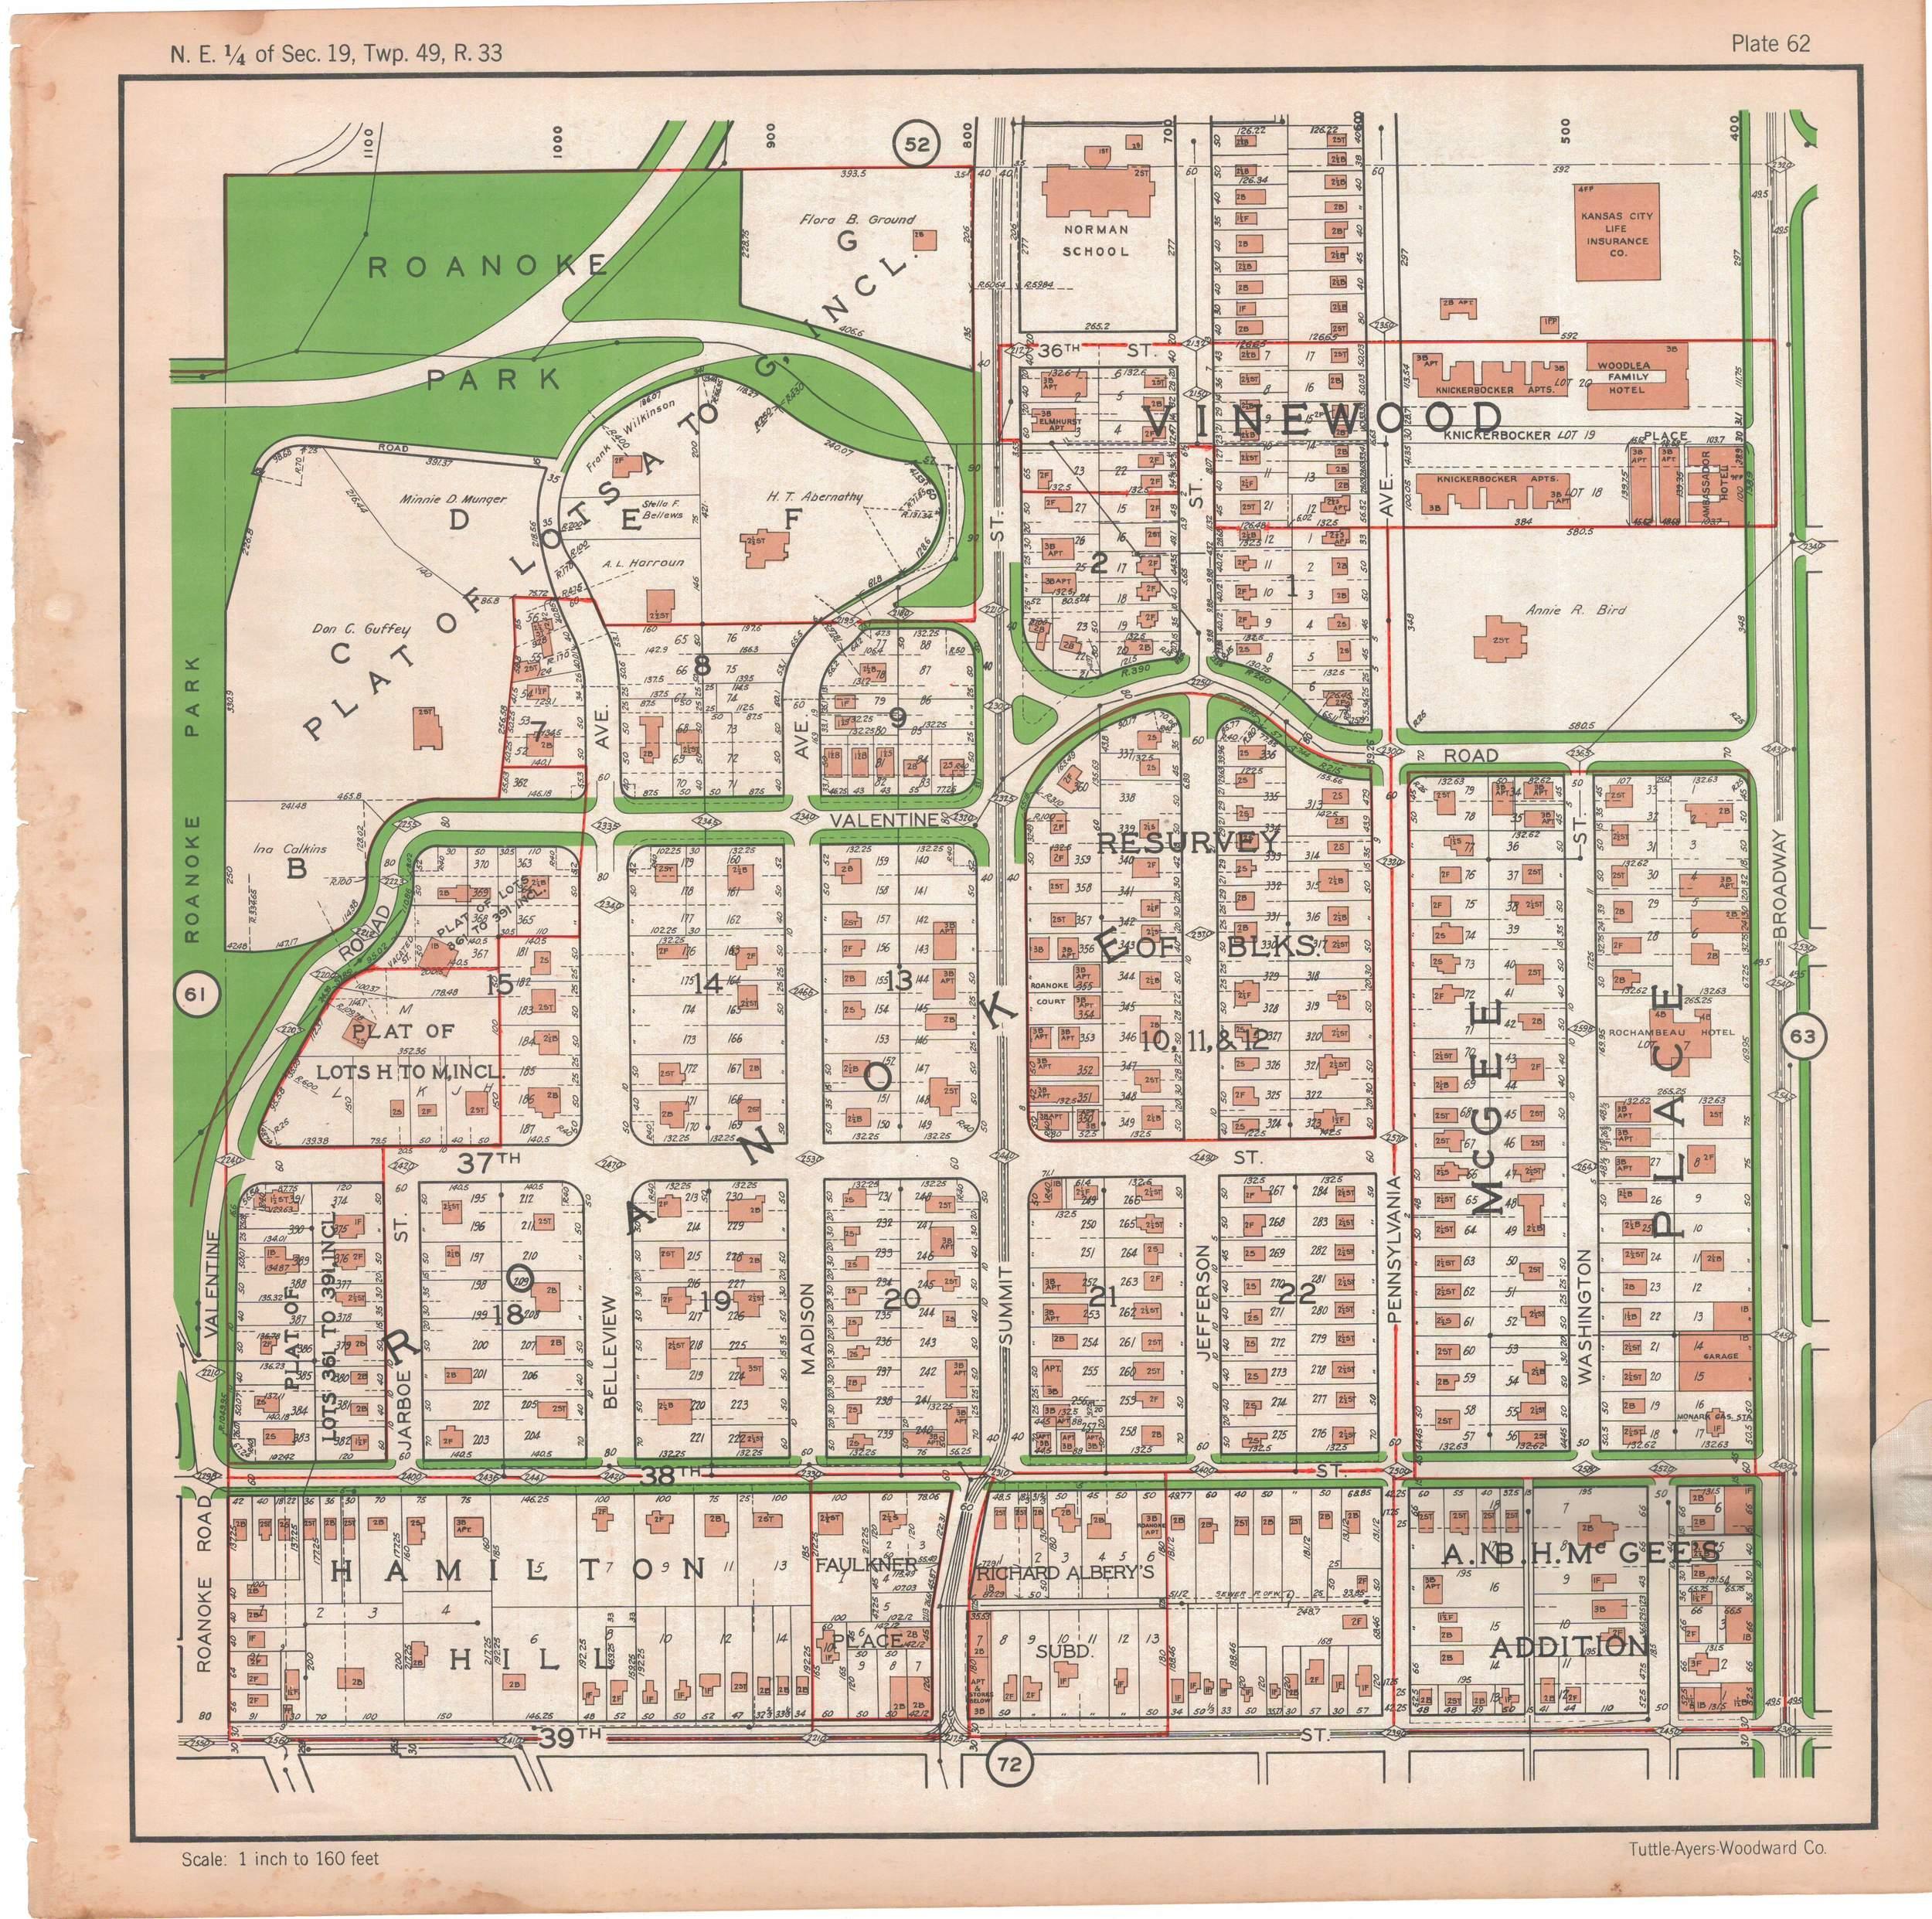 1925 TUTTLE_AYERS_Plate 62.JPG